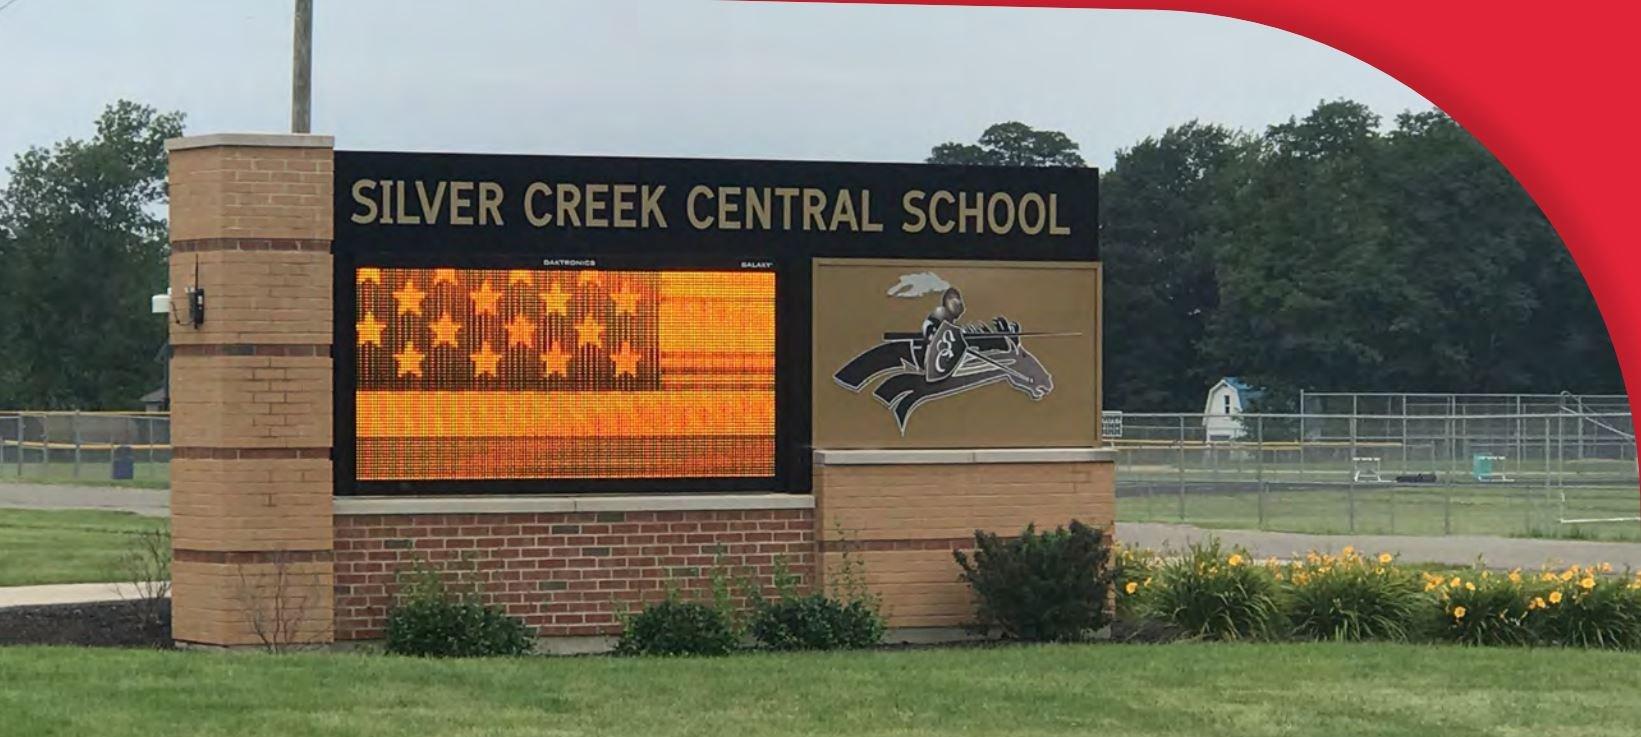 silver creek school fire alarm case study